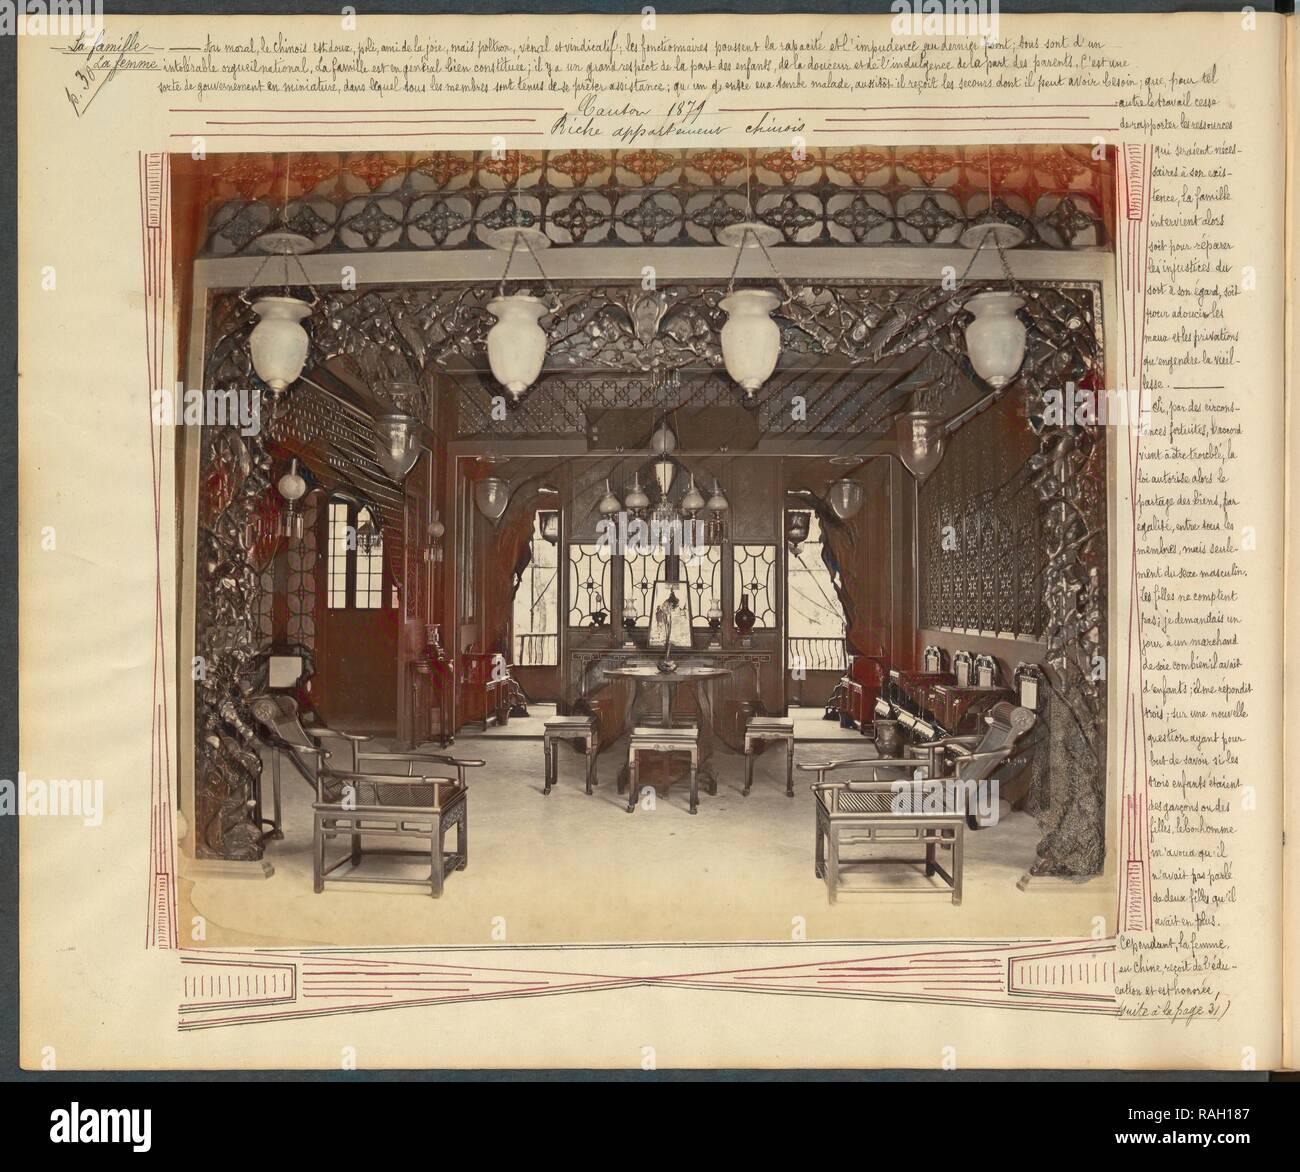 Canton, riche appartement chinois, Chine-Japon photographic album, Prat, G., Albumen, 1879. Reimagined - Stock Image